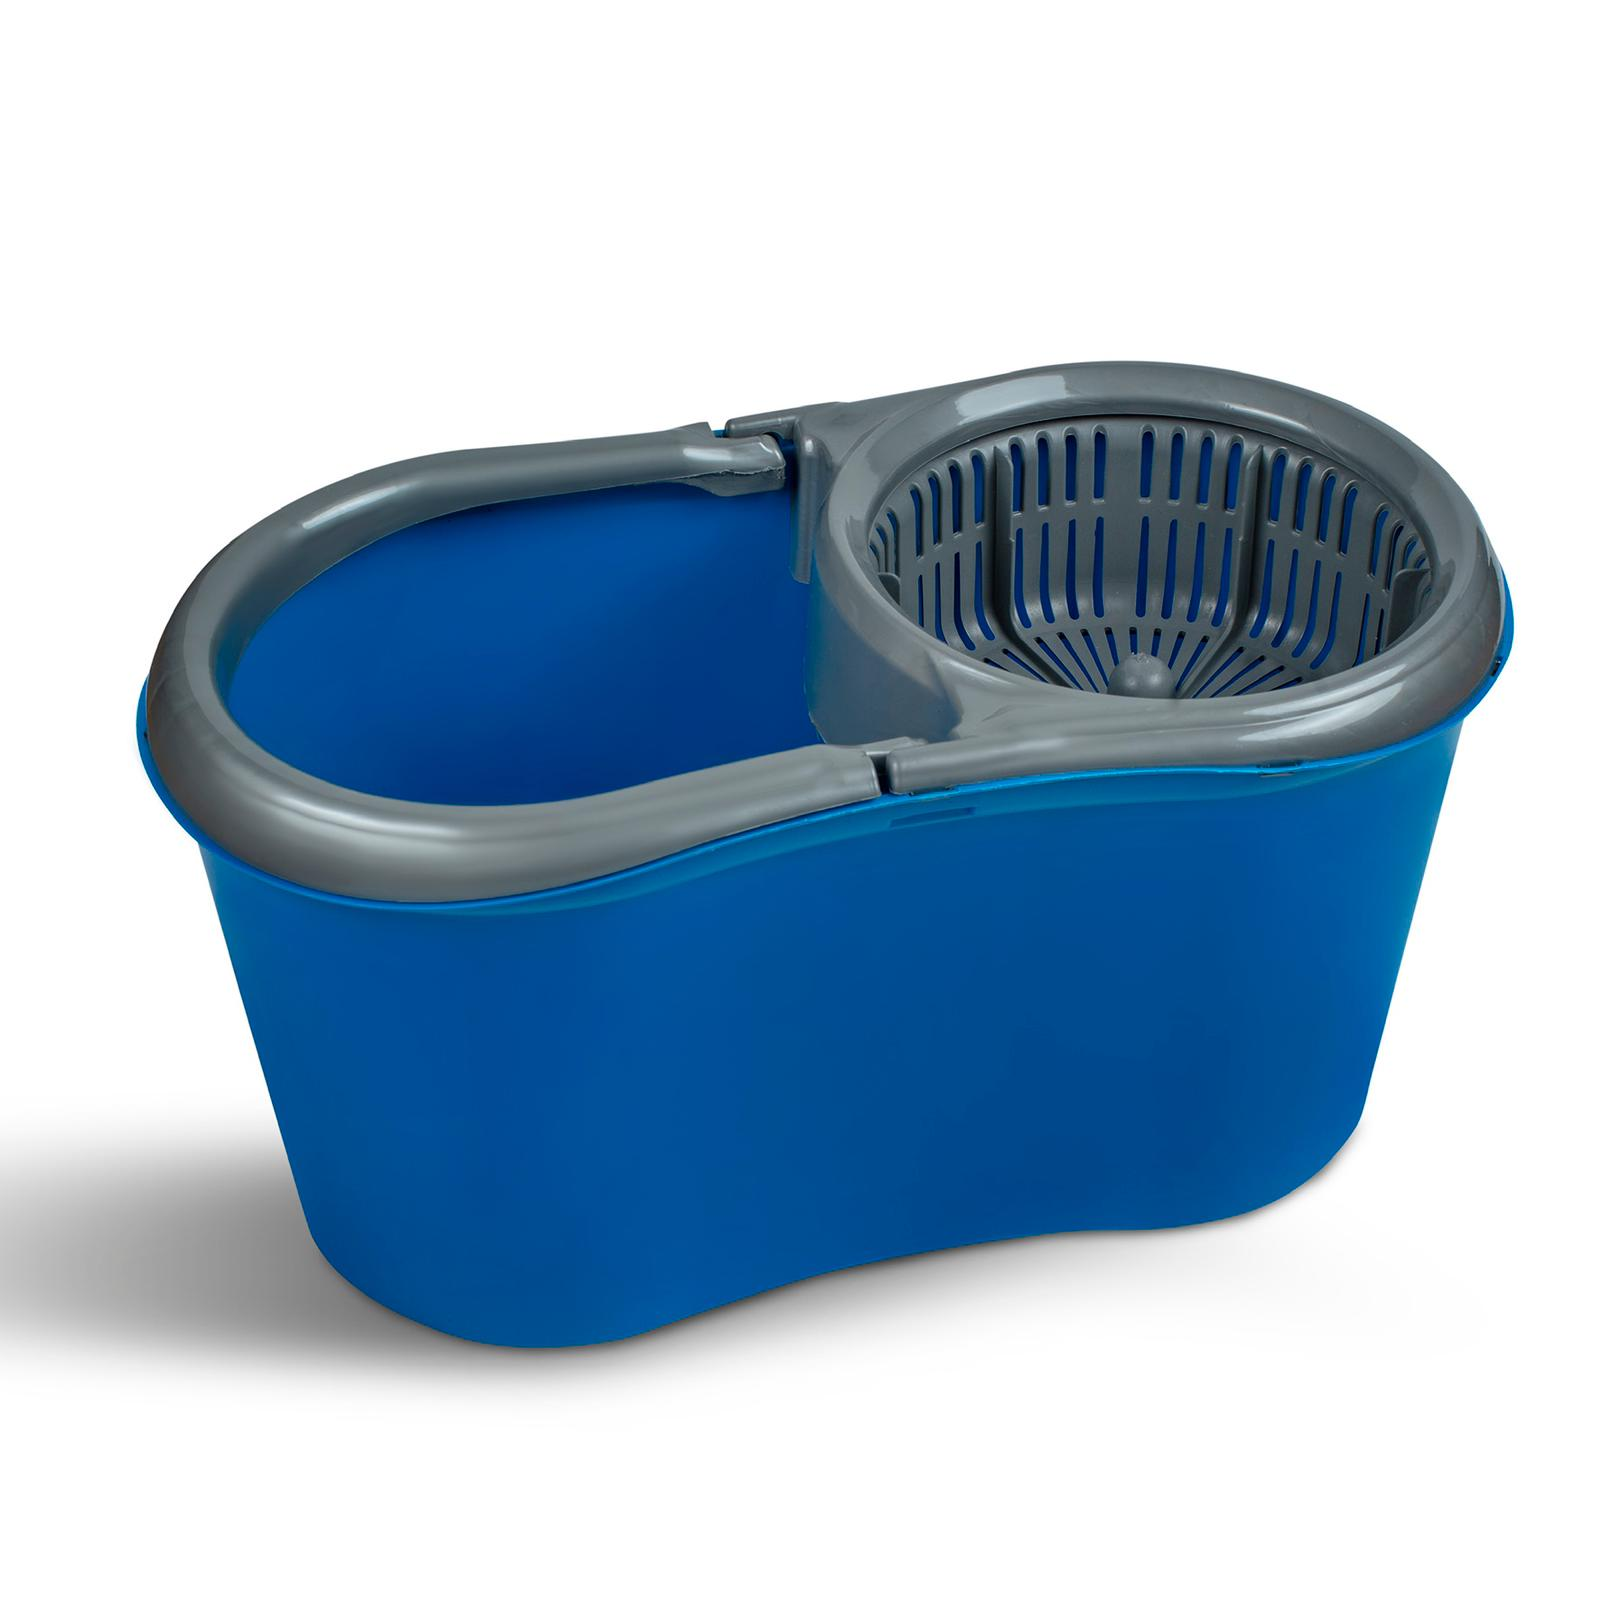 Twister Mop Set Blue